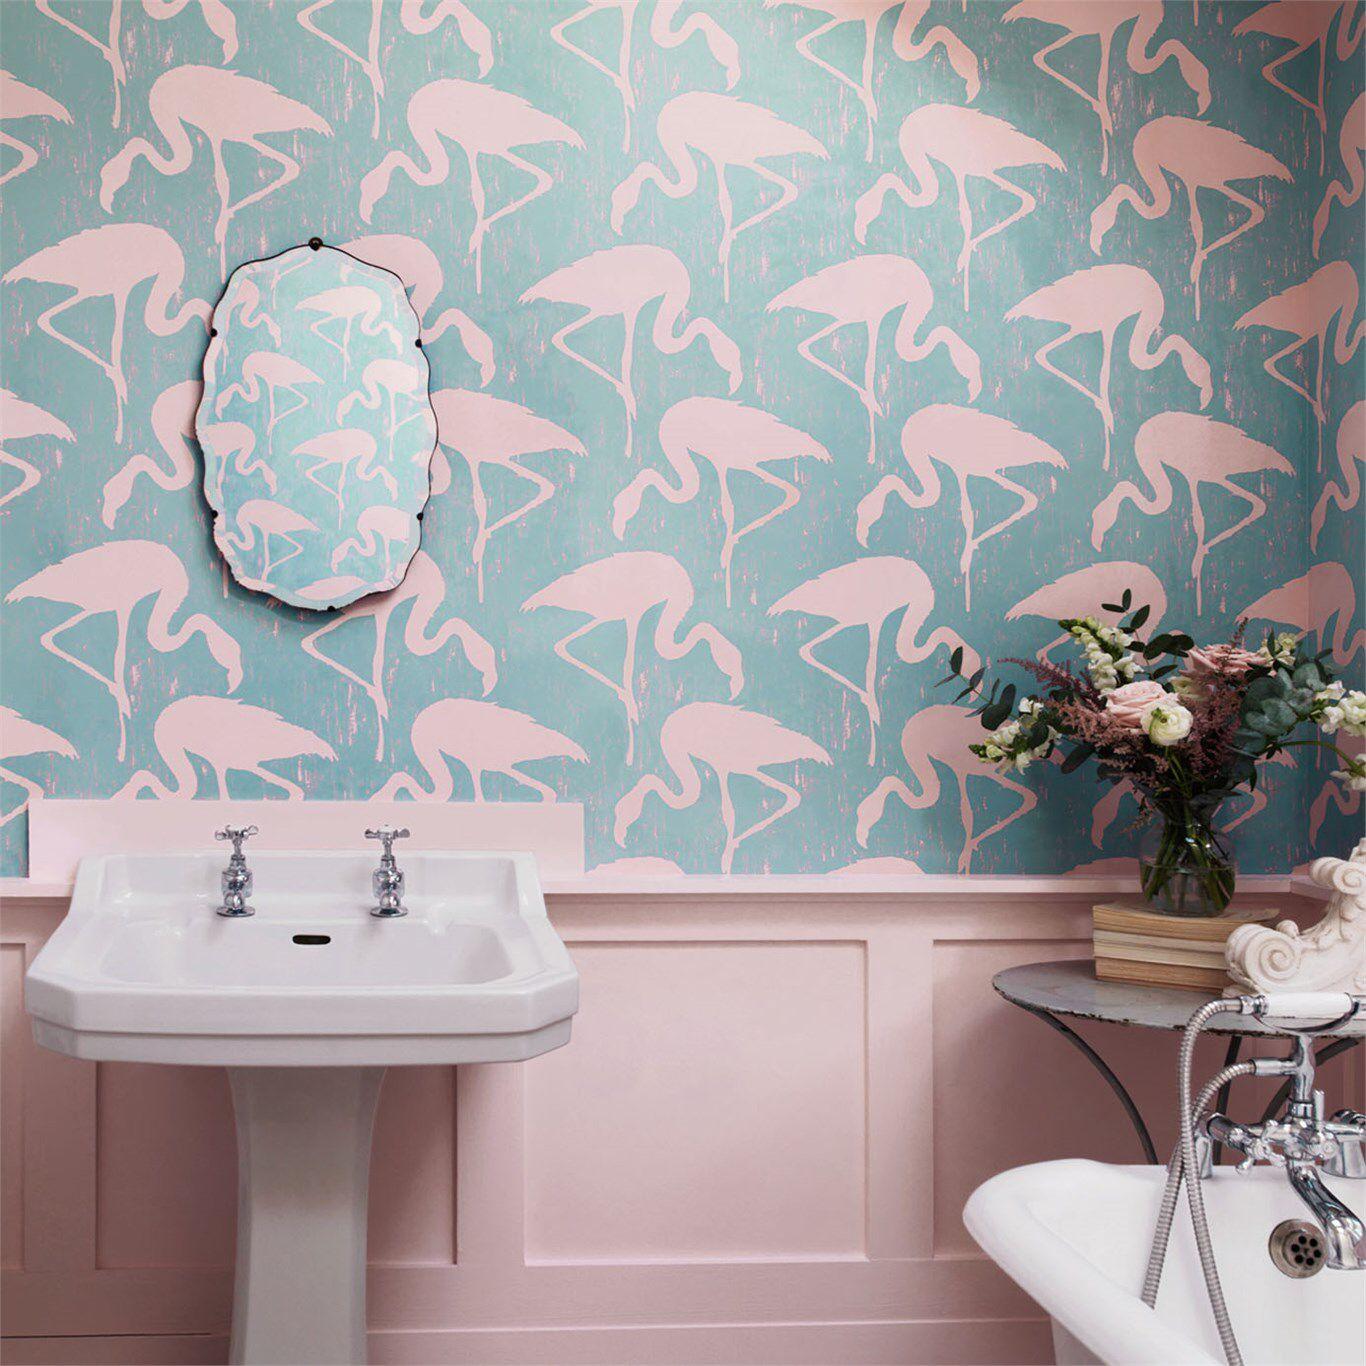 Flamingo bathroom decor - Flamingo Wallpaper